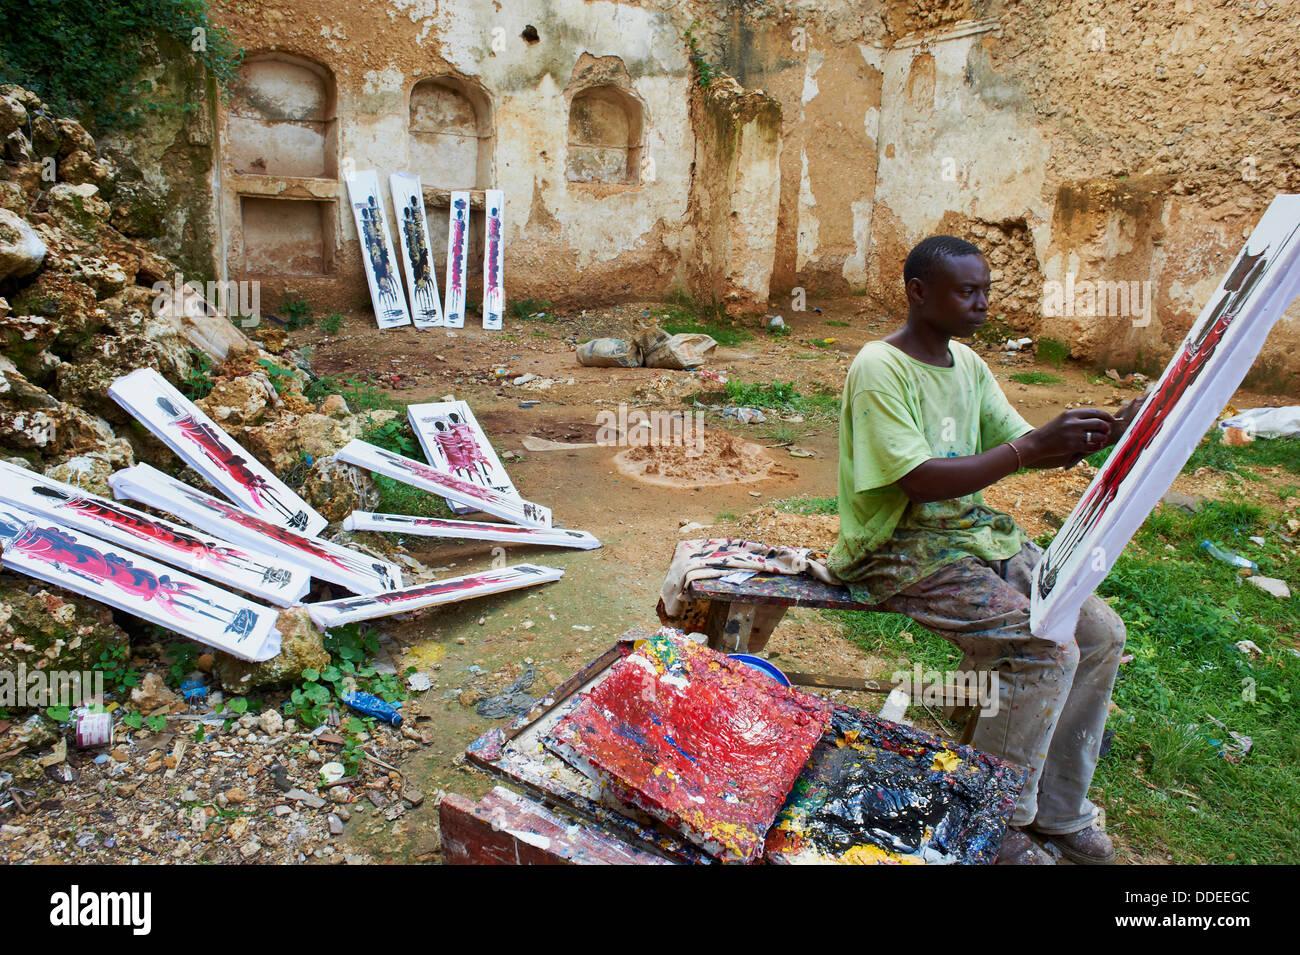 Tanzania, Zanzibar island, Unguja, Stone Town, unesco world heritage, artist painter - Stock Image